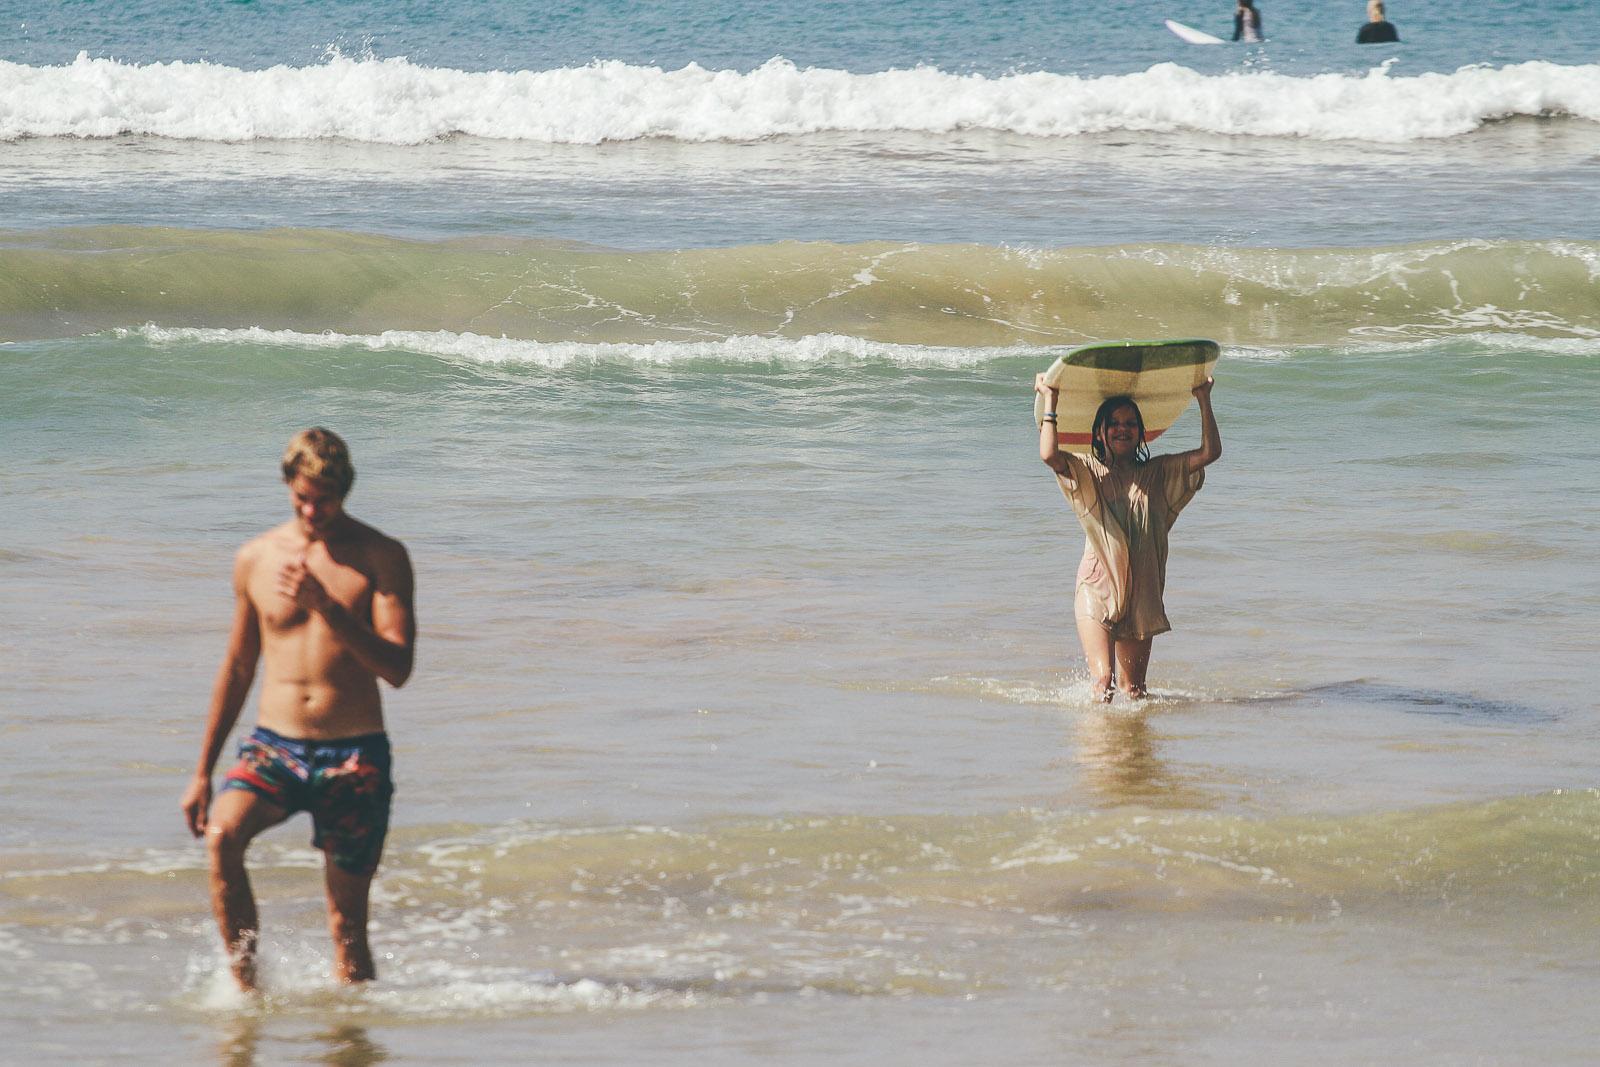 Sunshinestories-Sri-Lanka-Medawatta-Medawata-Meda-Watta-Mada-surf-Lonboard-Surfing-Wave-Surf-School-Camp-Yoga-Studio-IMG_0282